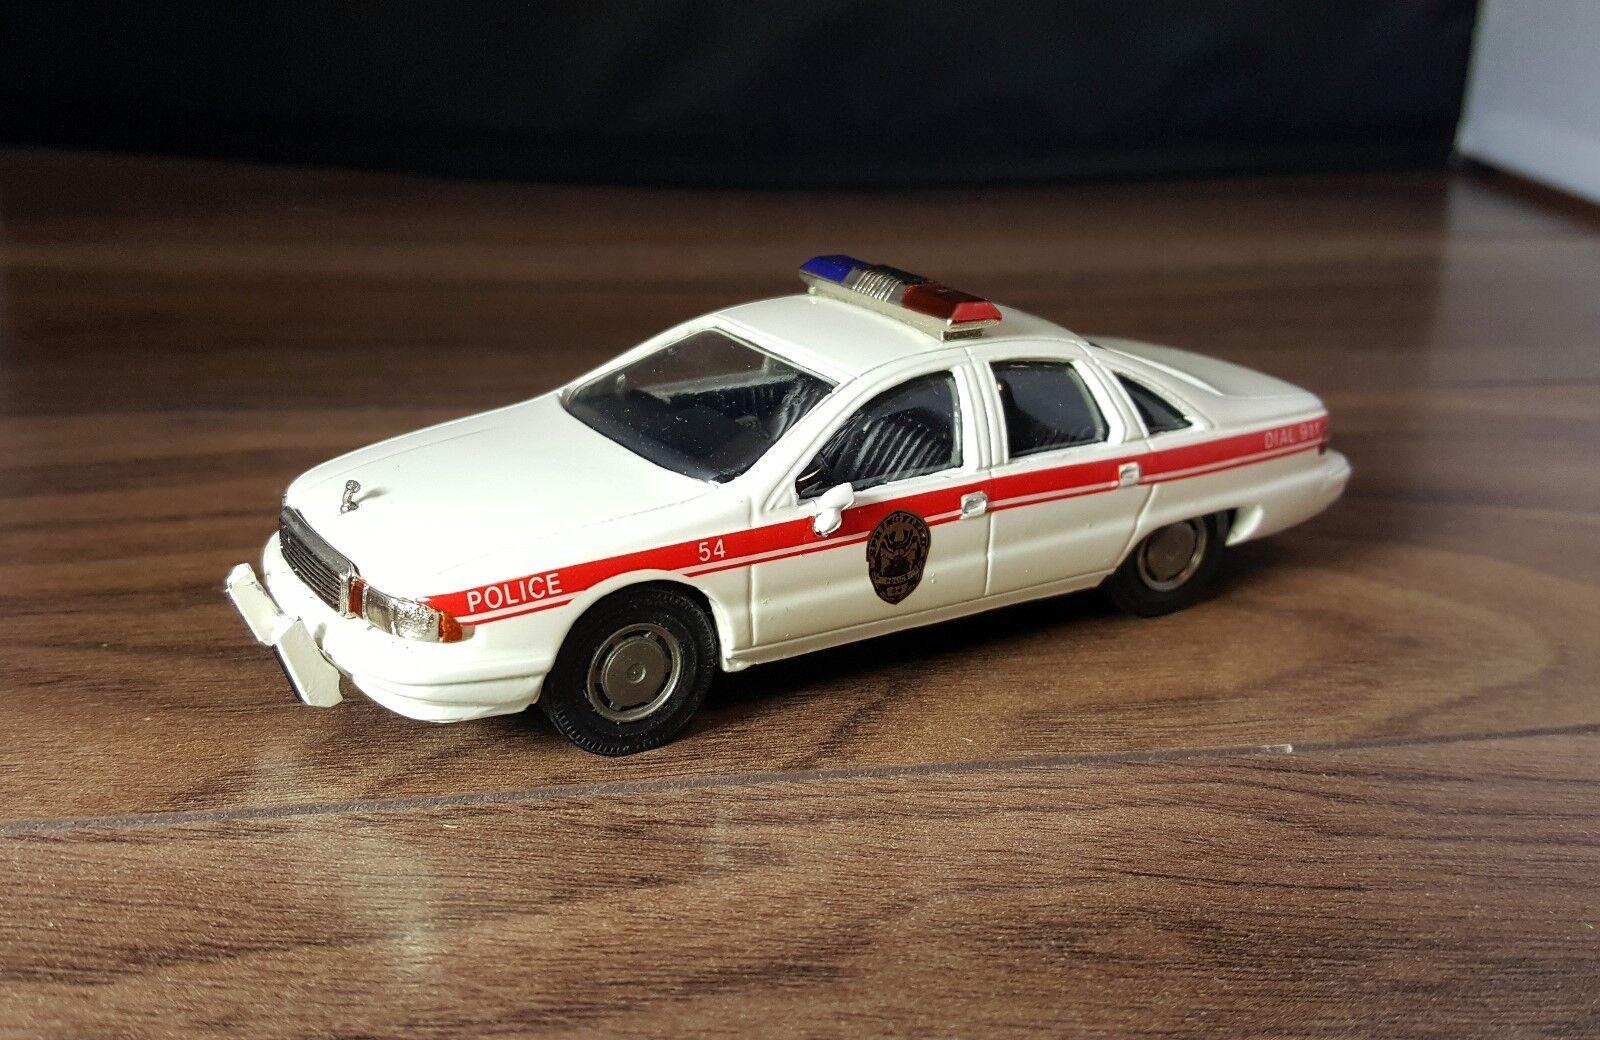 1991 CHEVROLET CAPRICE POLICE - 1 43 IF ITGOT WHEELS HANDMADE IN ENGLAND RARE